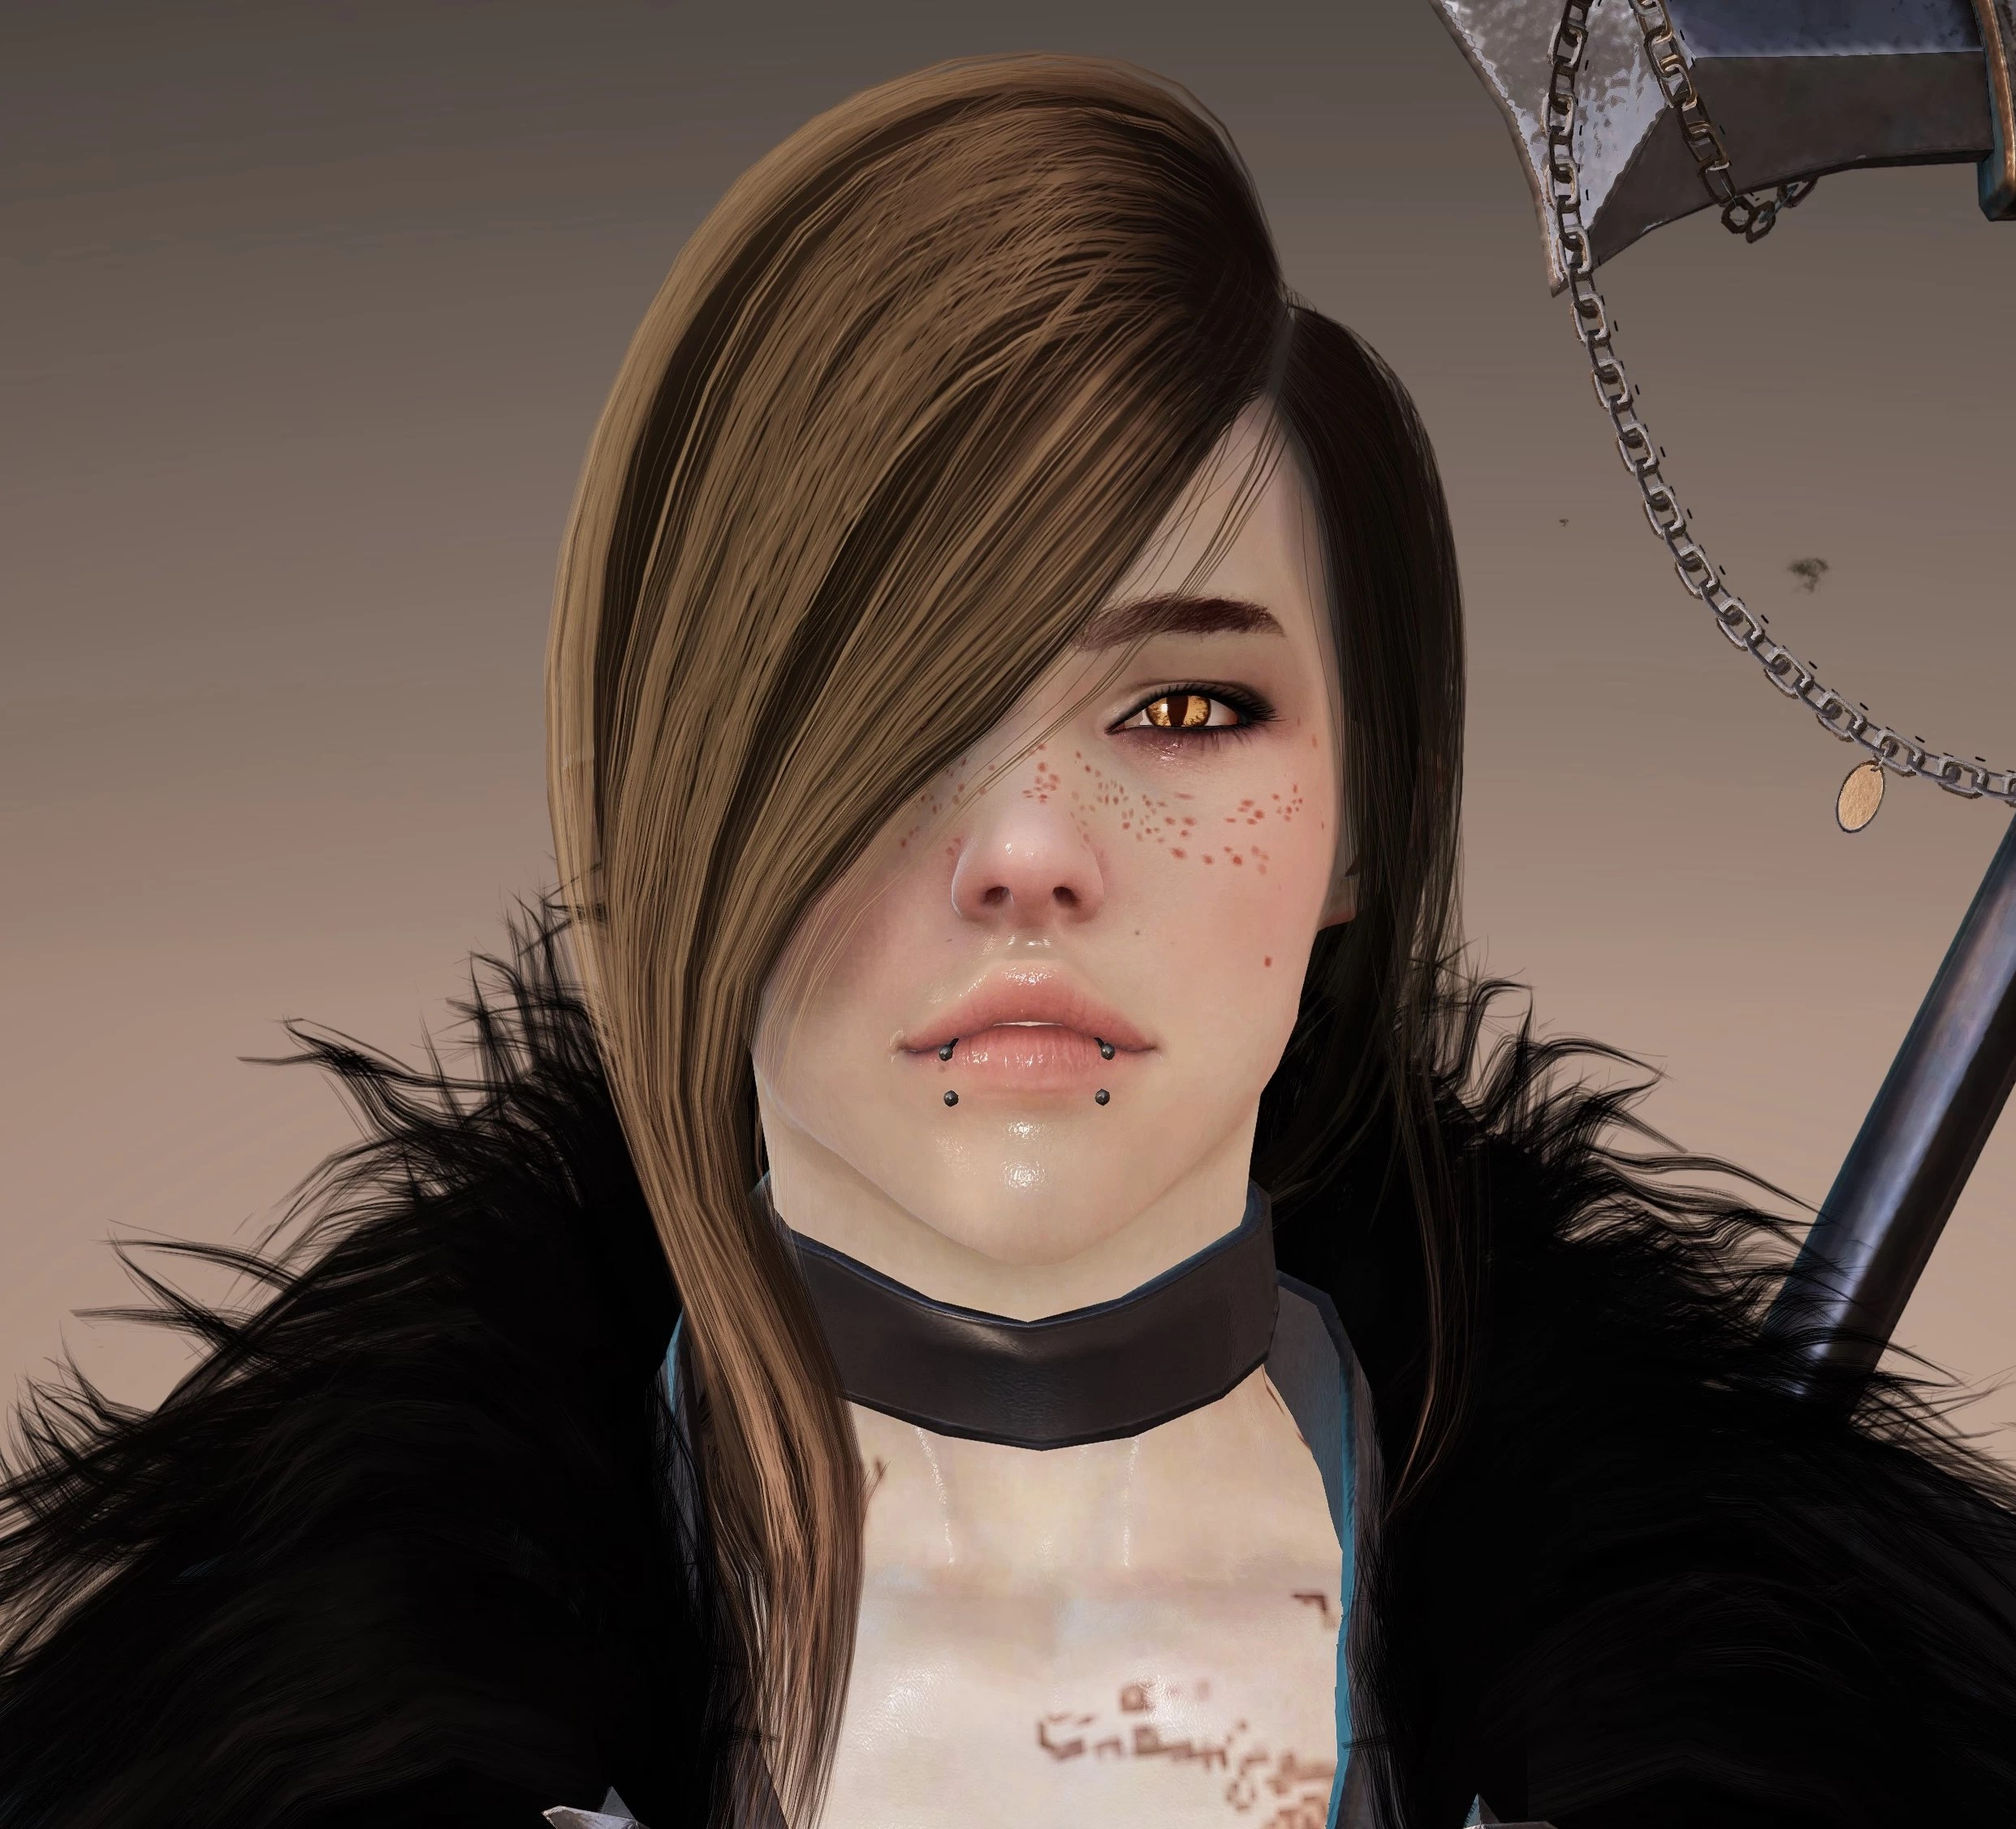 Vhyserra, The Twilight Crow [NA]